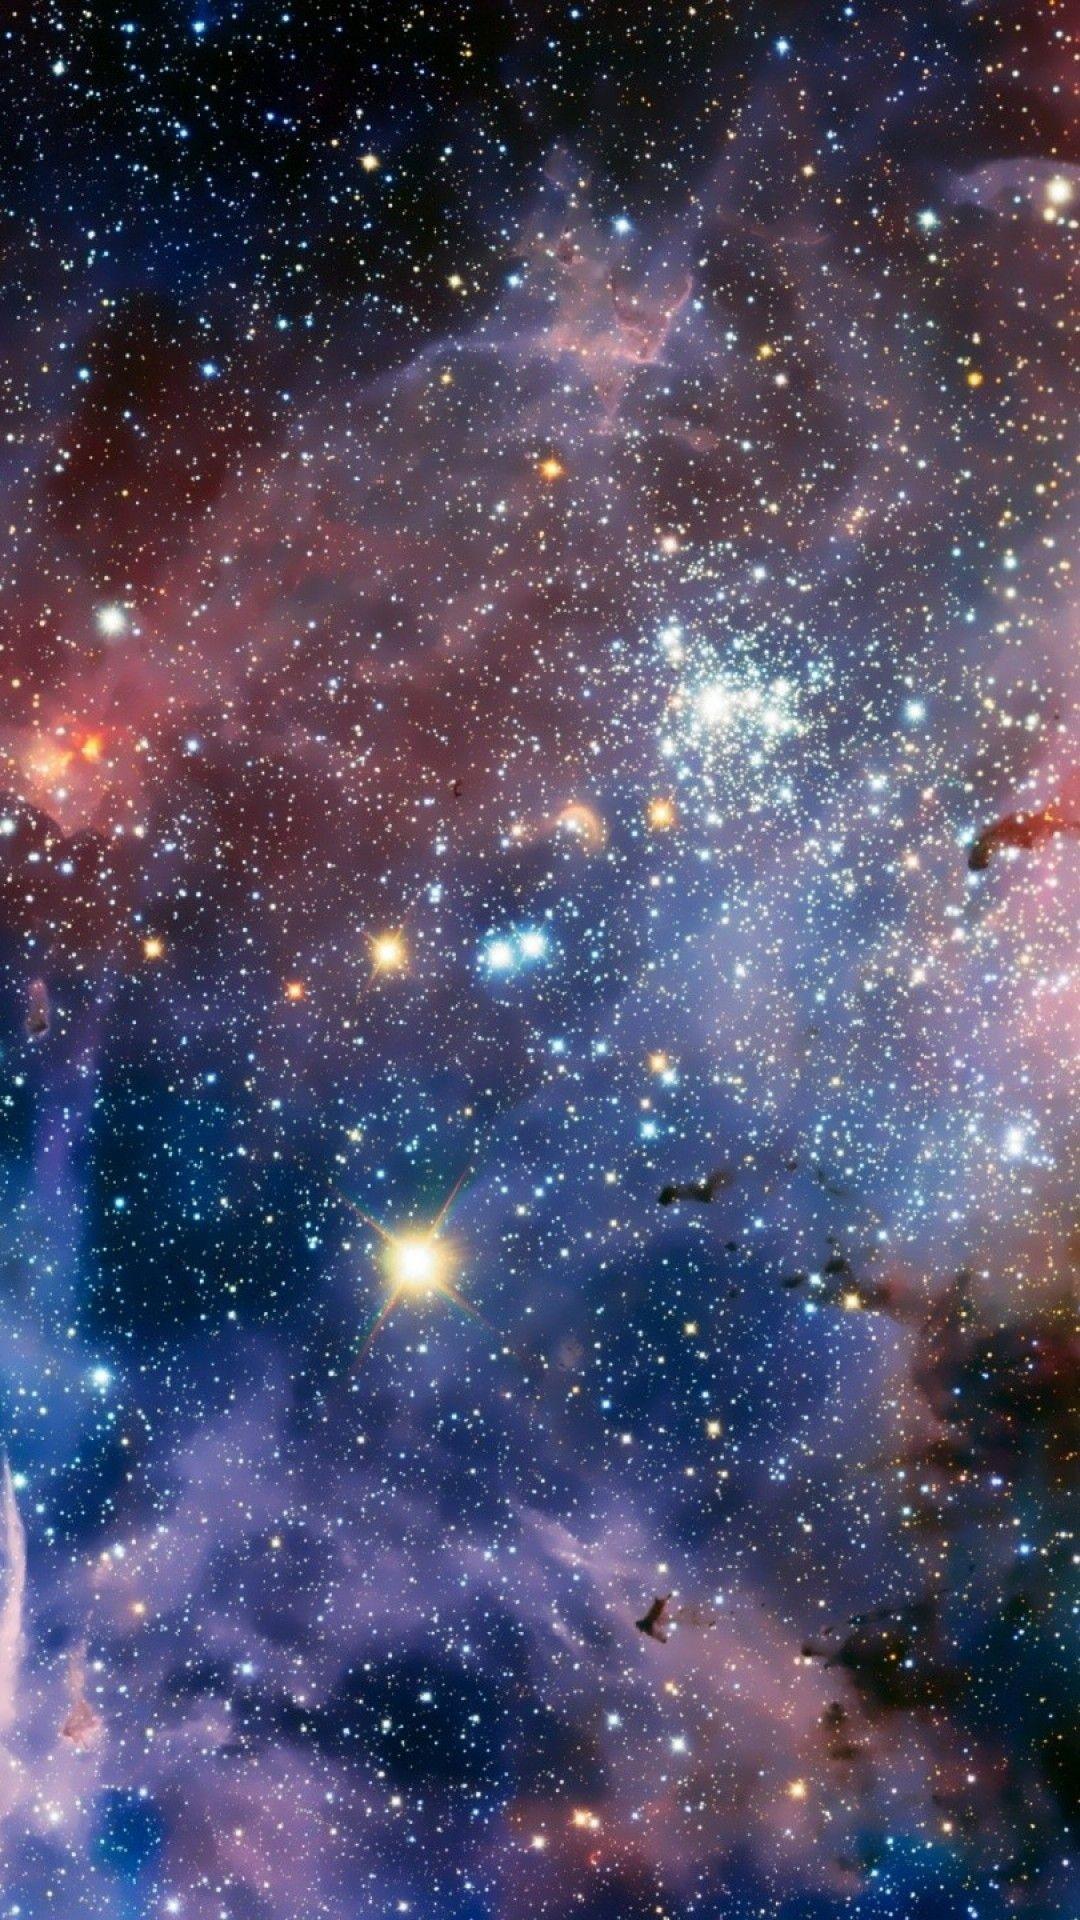 stars-wallpaper-iphone-4-space-stars-iphone-6-